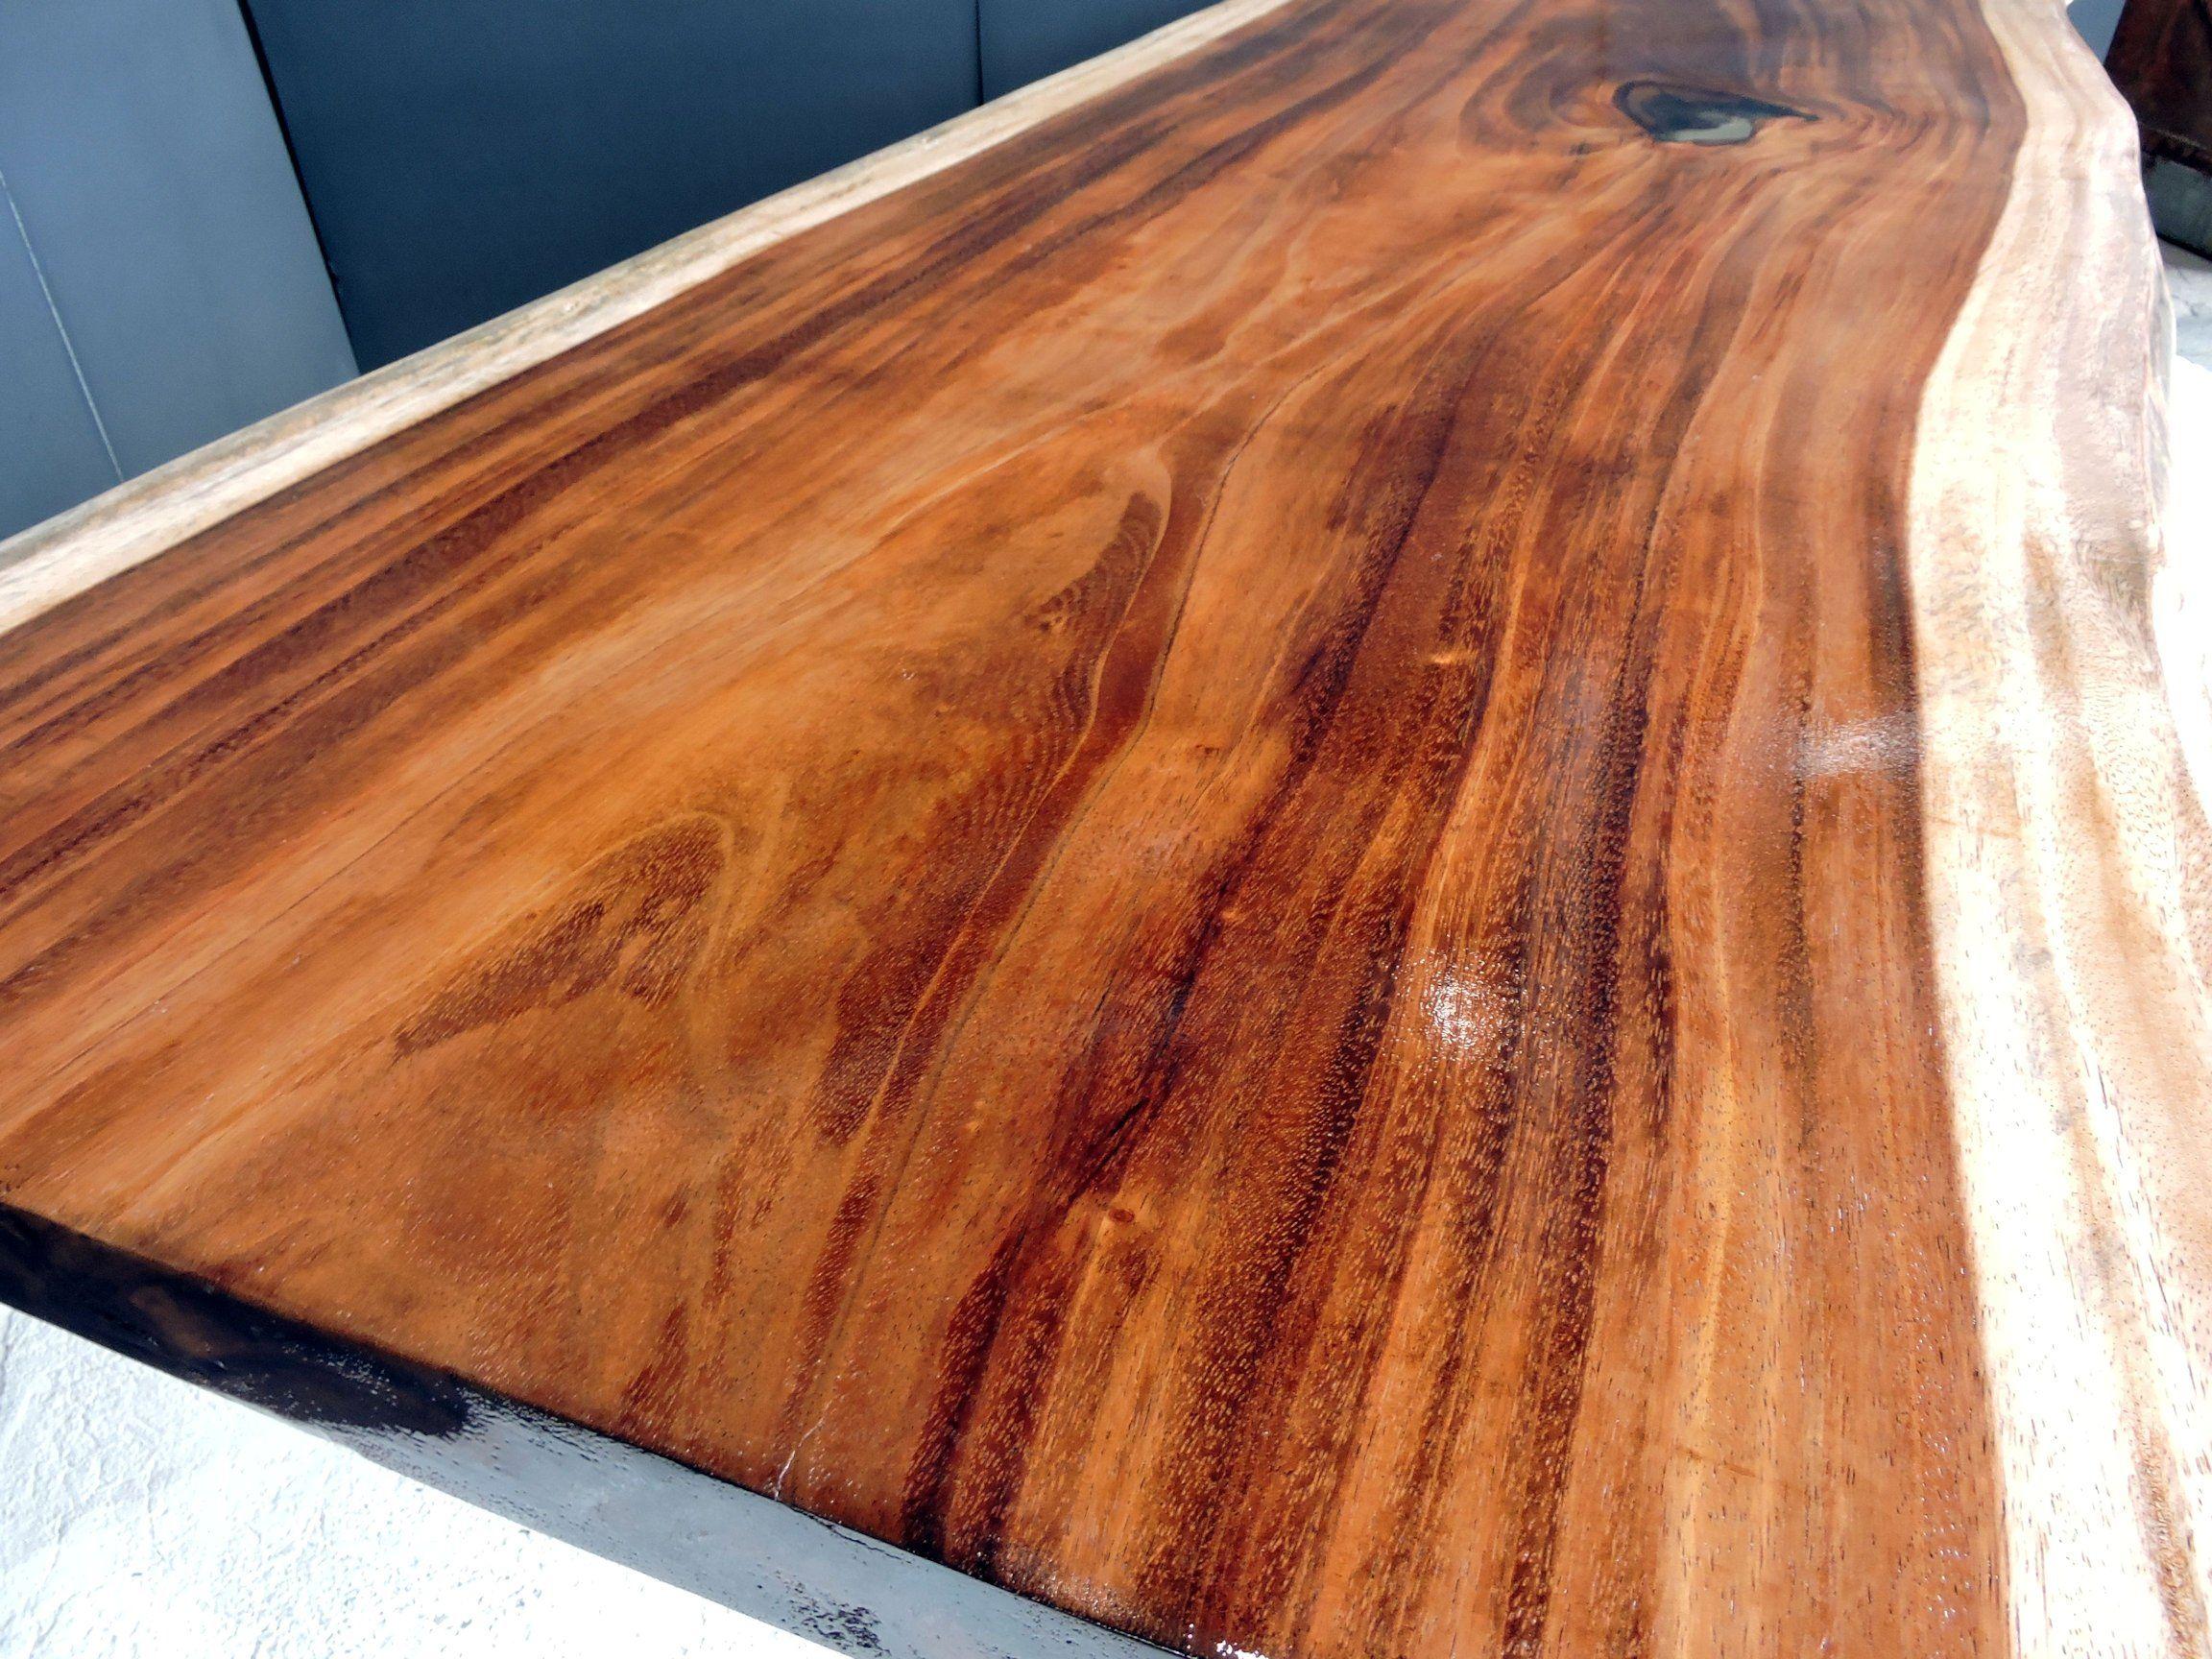 Devos Custom Woodworking Sipo Mahogany Wood Countertop Photo Gallery Wood Slab Countertop Live Edge Wood Wood Slab